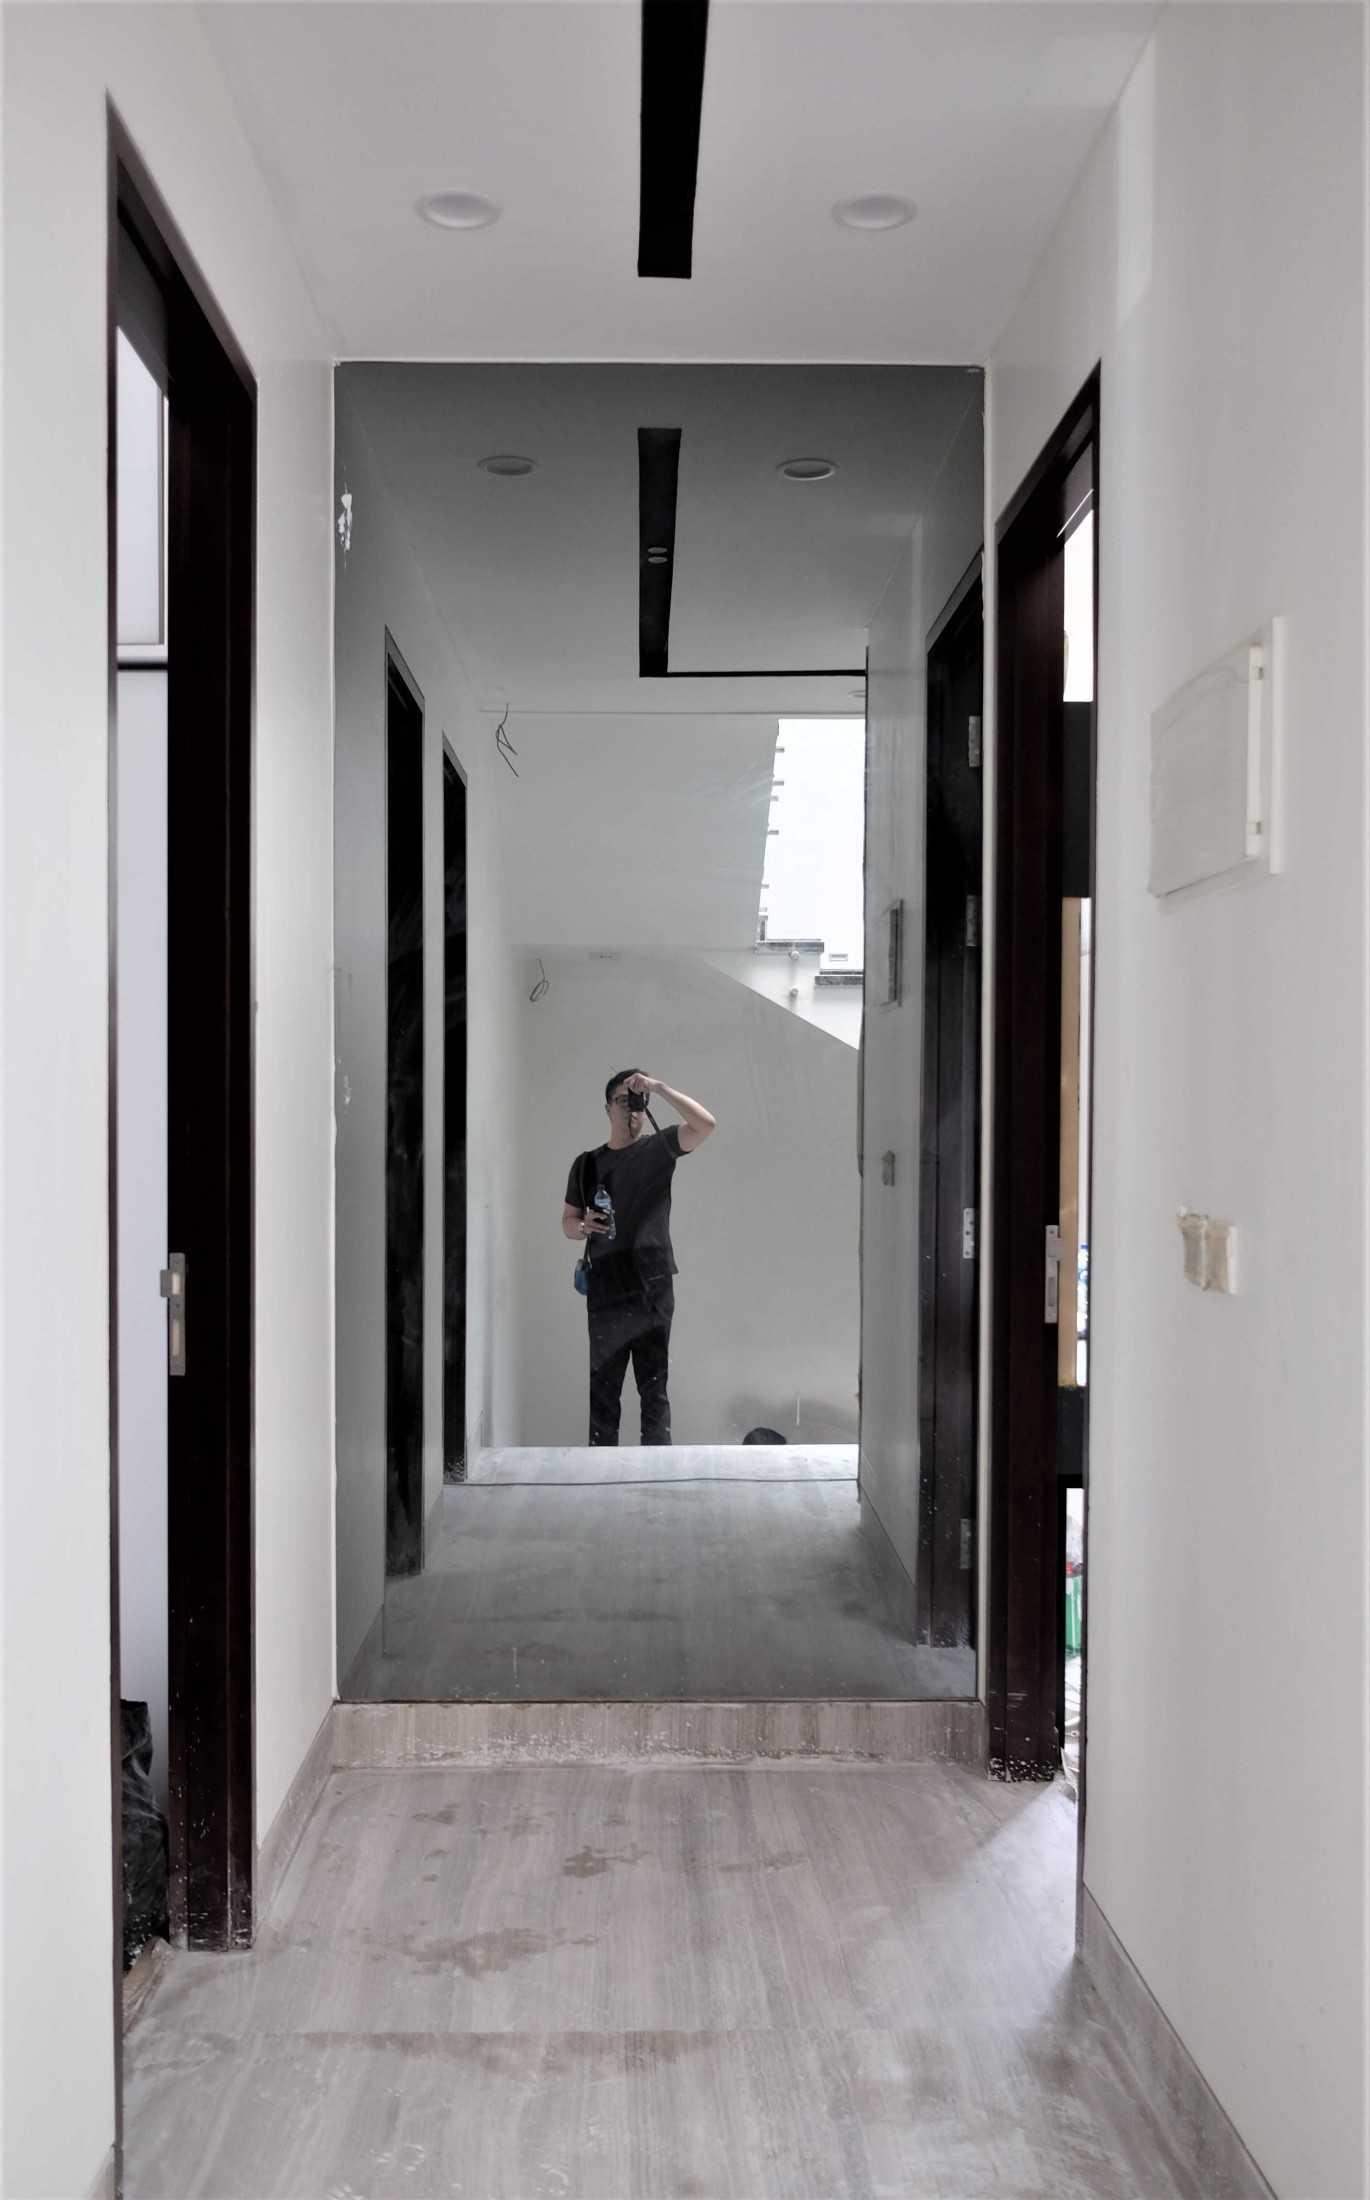 Einhaus Luckypark Residence Unnamed Road, Rt.7/rw.3, Kapuk Muara, Penjaringan, North Jakarta City, Jakarta 14460, Indonesia Unnamed Road, Rt.7/rw.3, Kapuk Muara, Penjaringan, North Jakarta City, Jakarta 14460, Indonesia Einhaus-Luckypark-Residence  105792